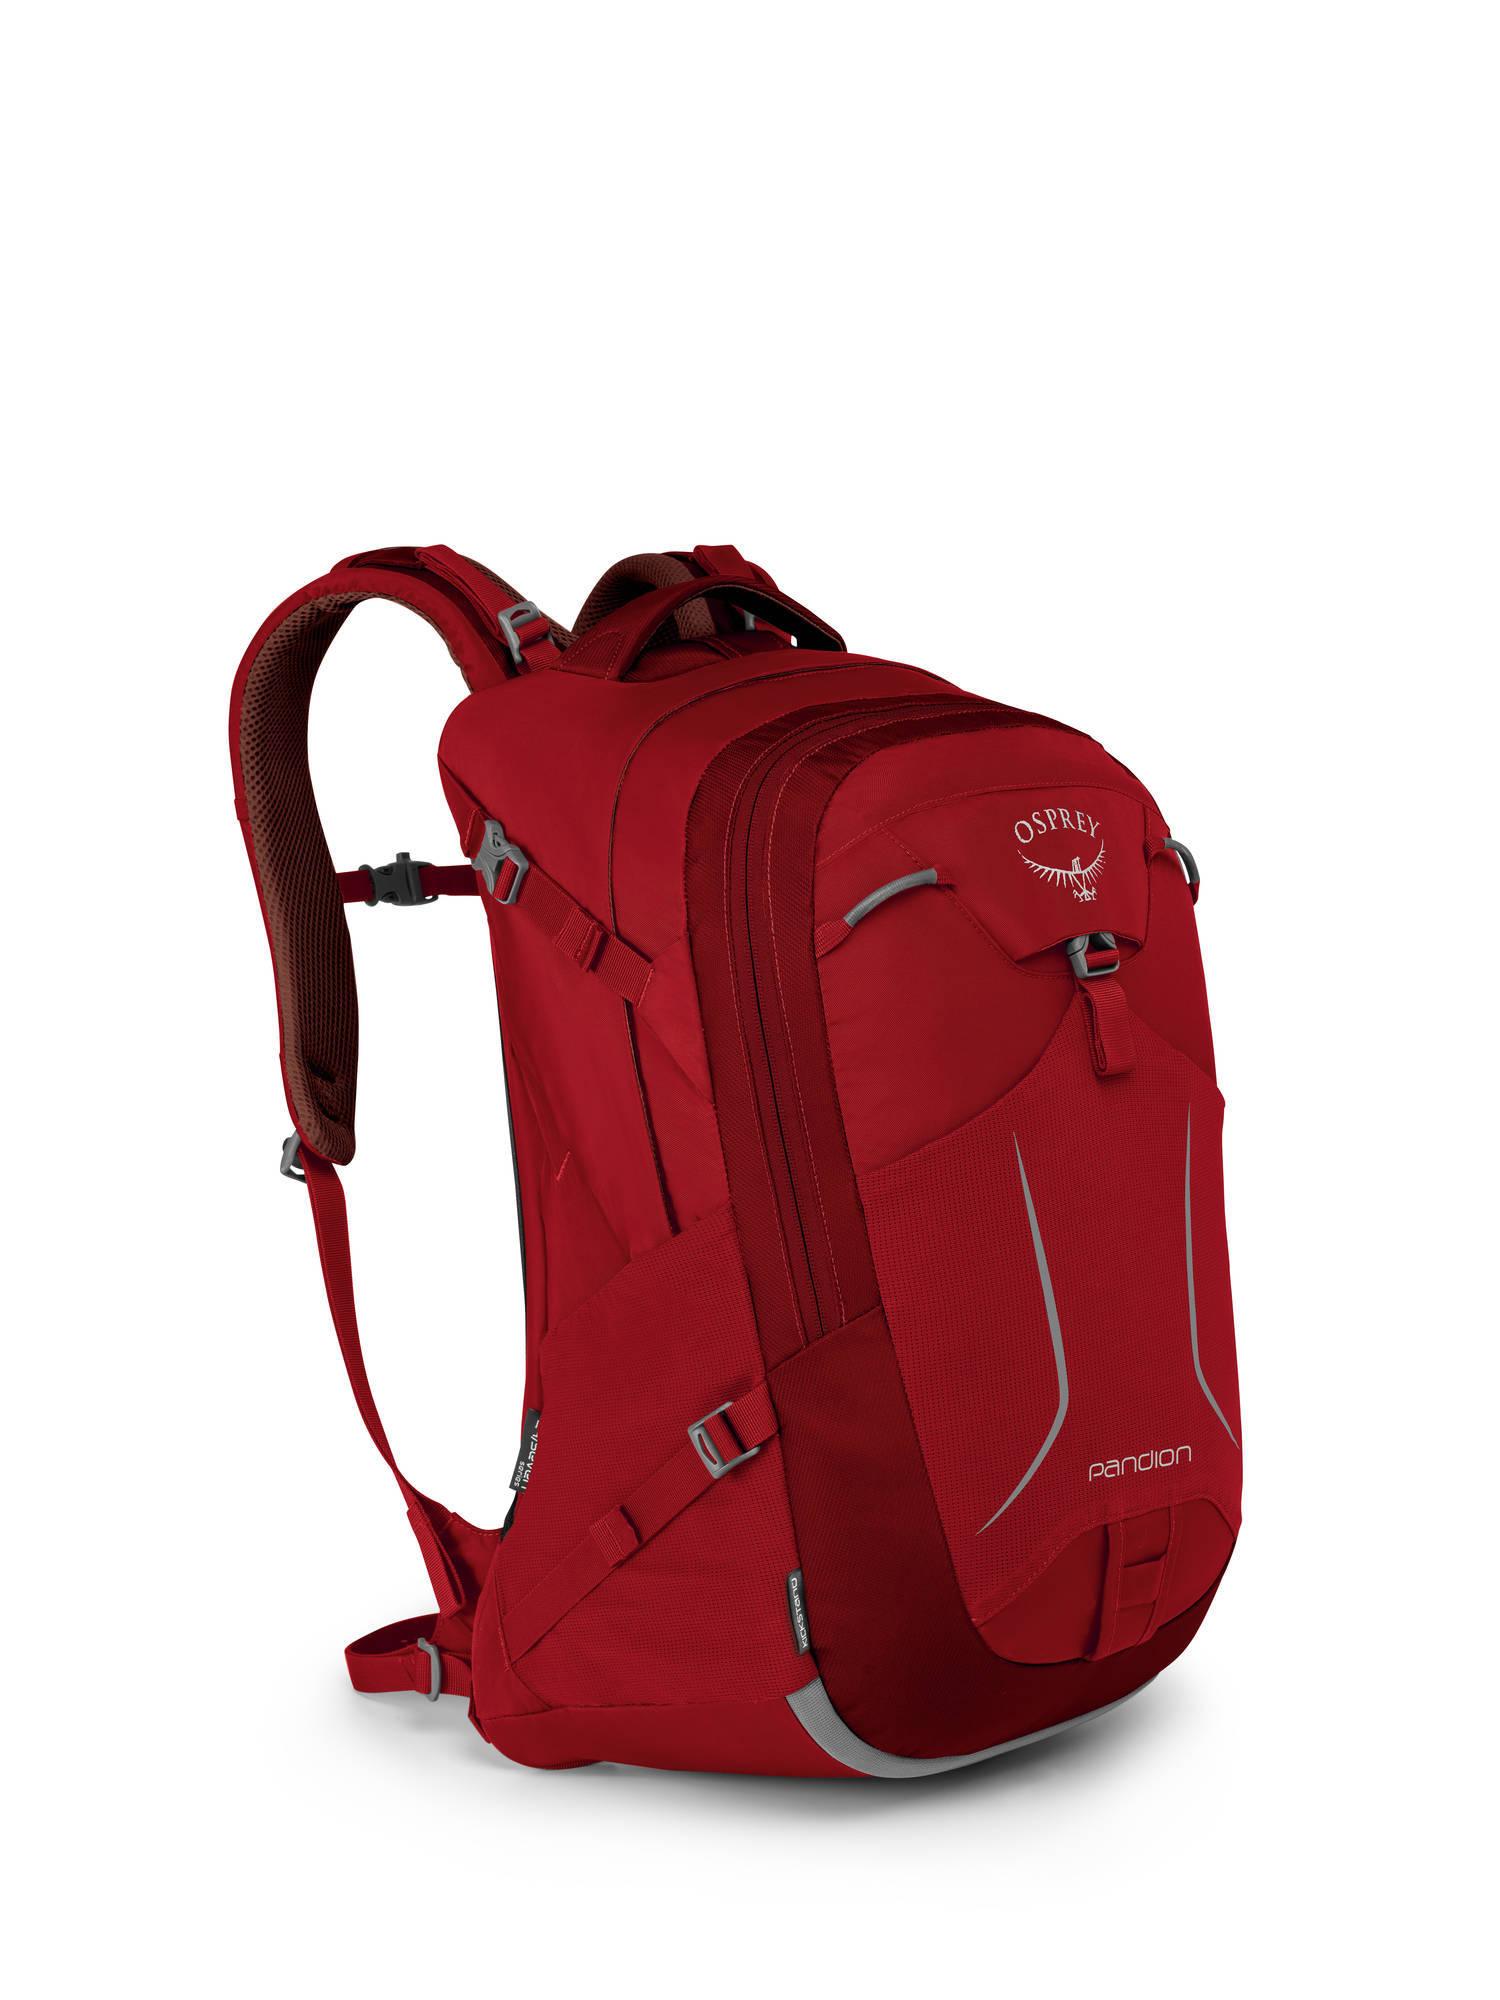 Городские рюкзаки Рюкзак городской Osprey Pandion 28 Robust Red Pandion_F17_Side_Robust_Red_web.jpg